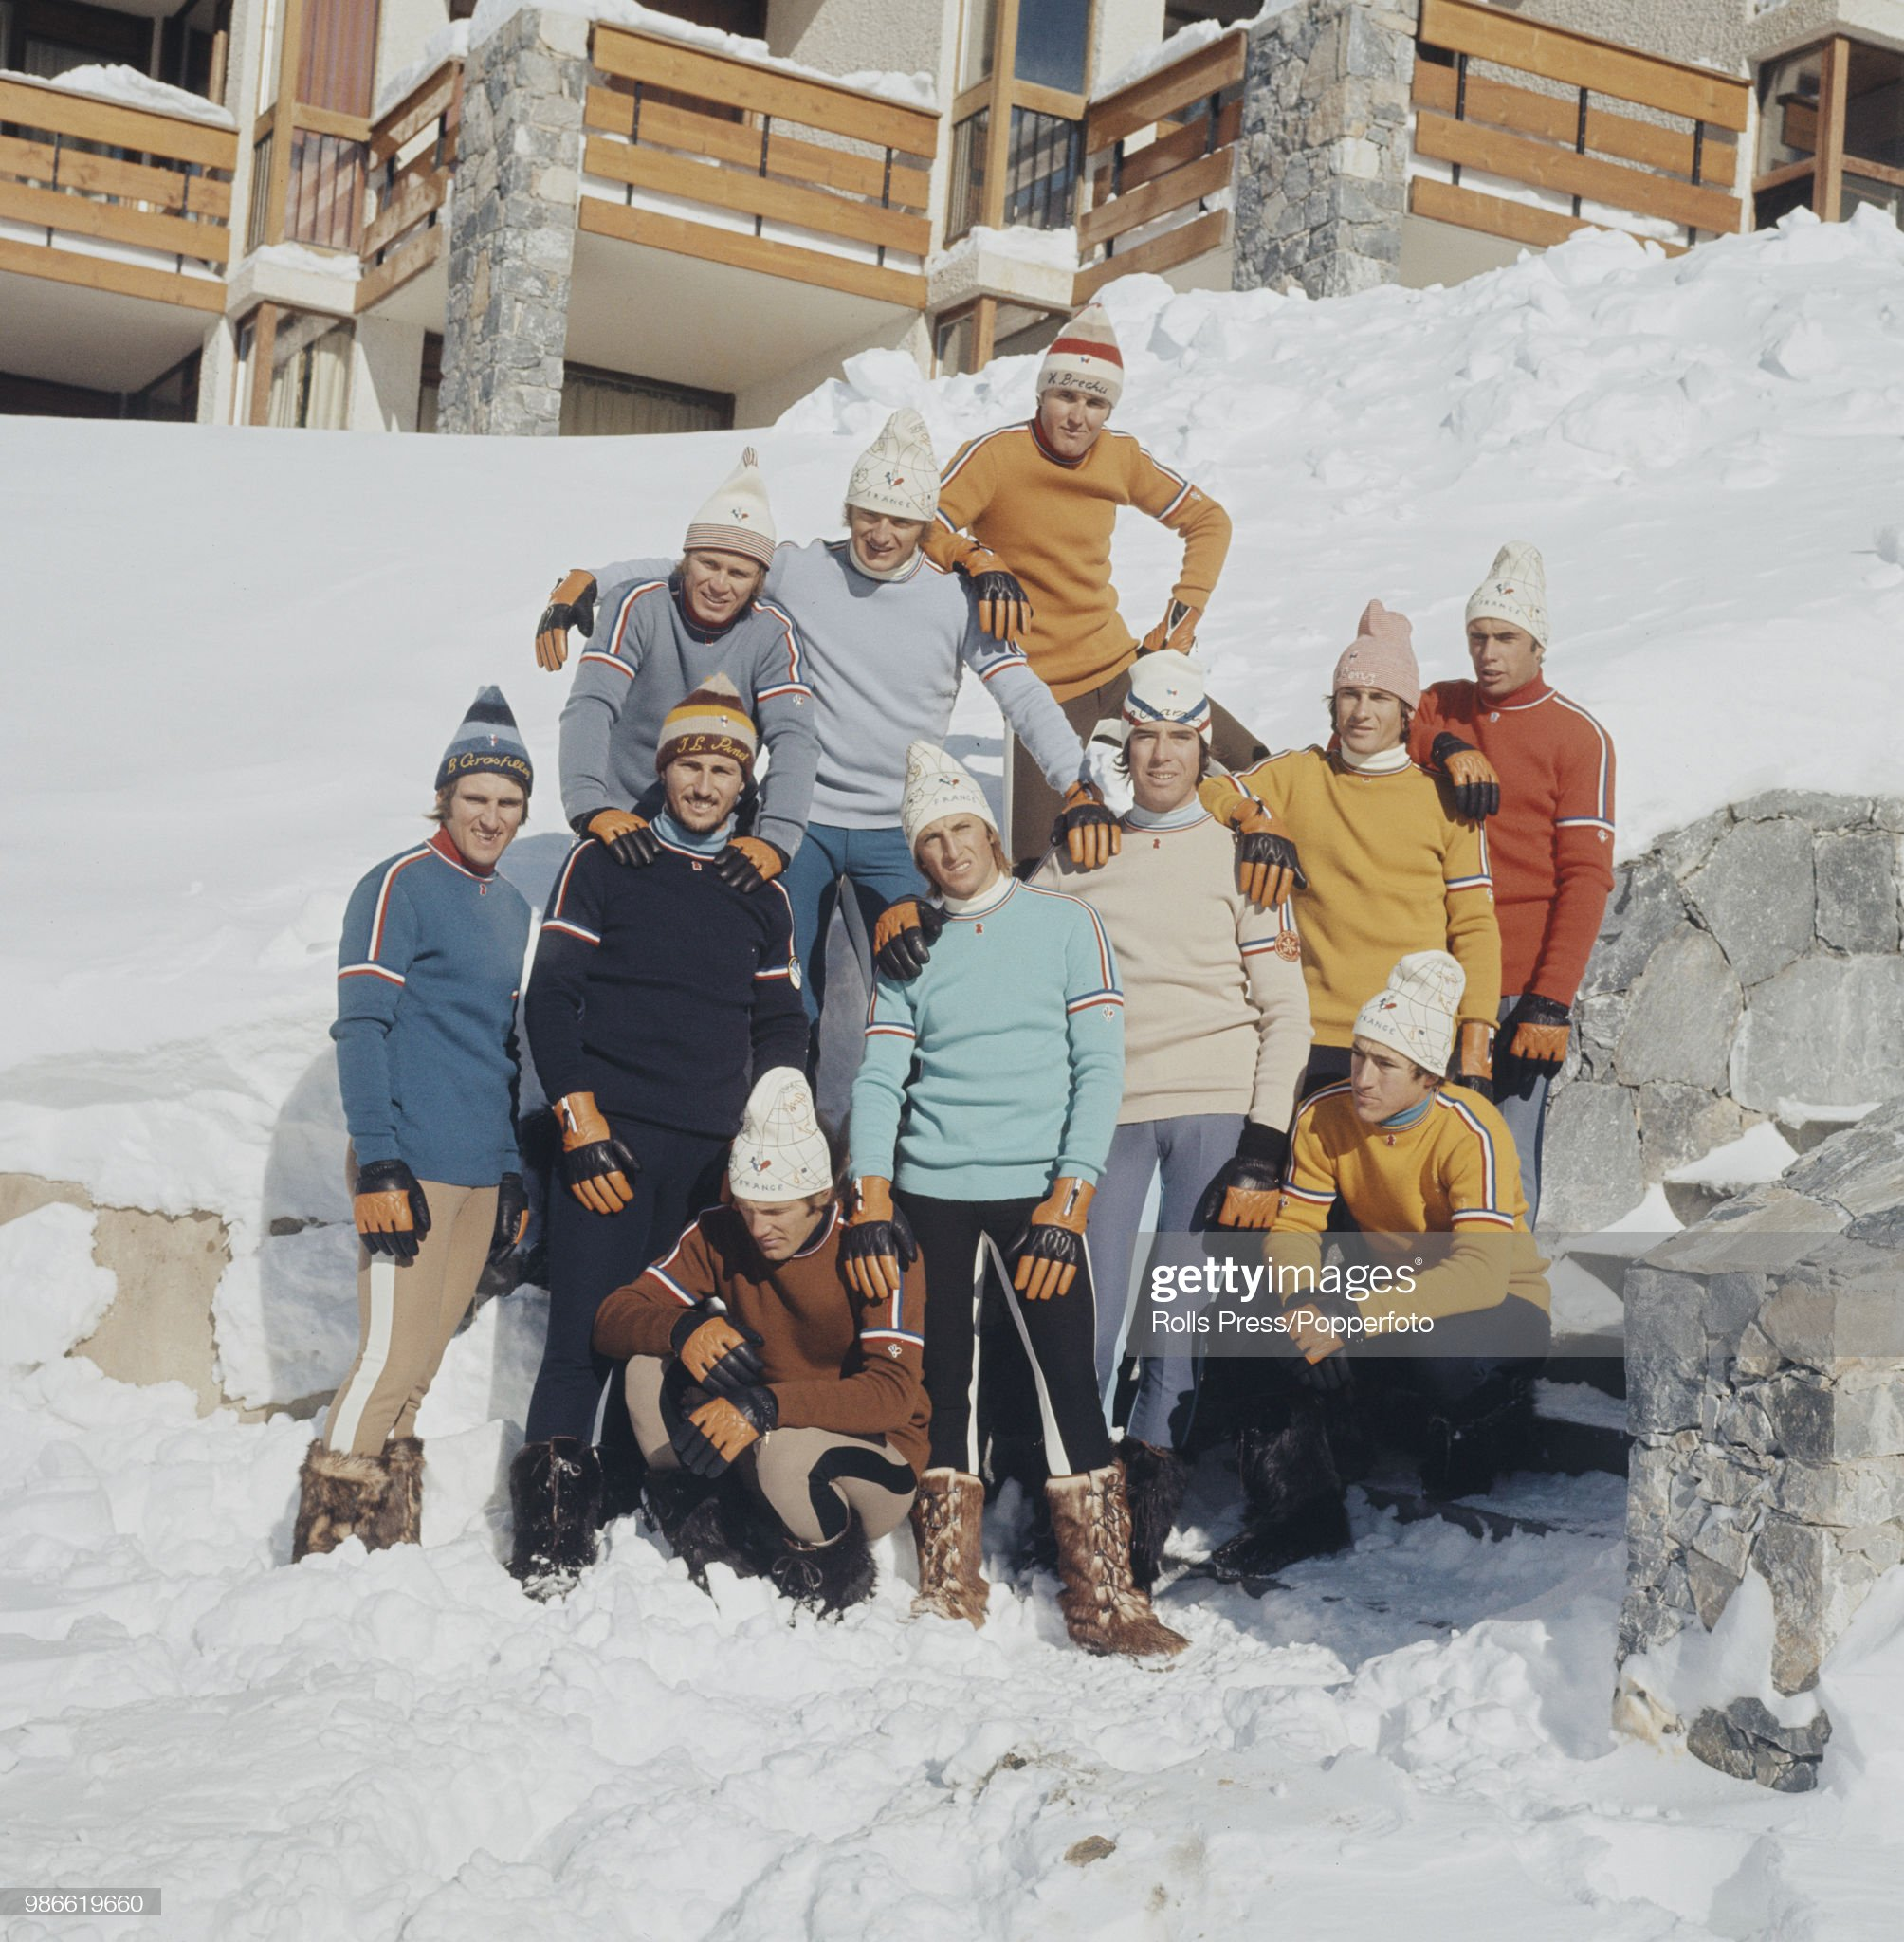 French Ski Team : Photo d'actualité